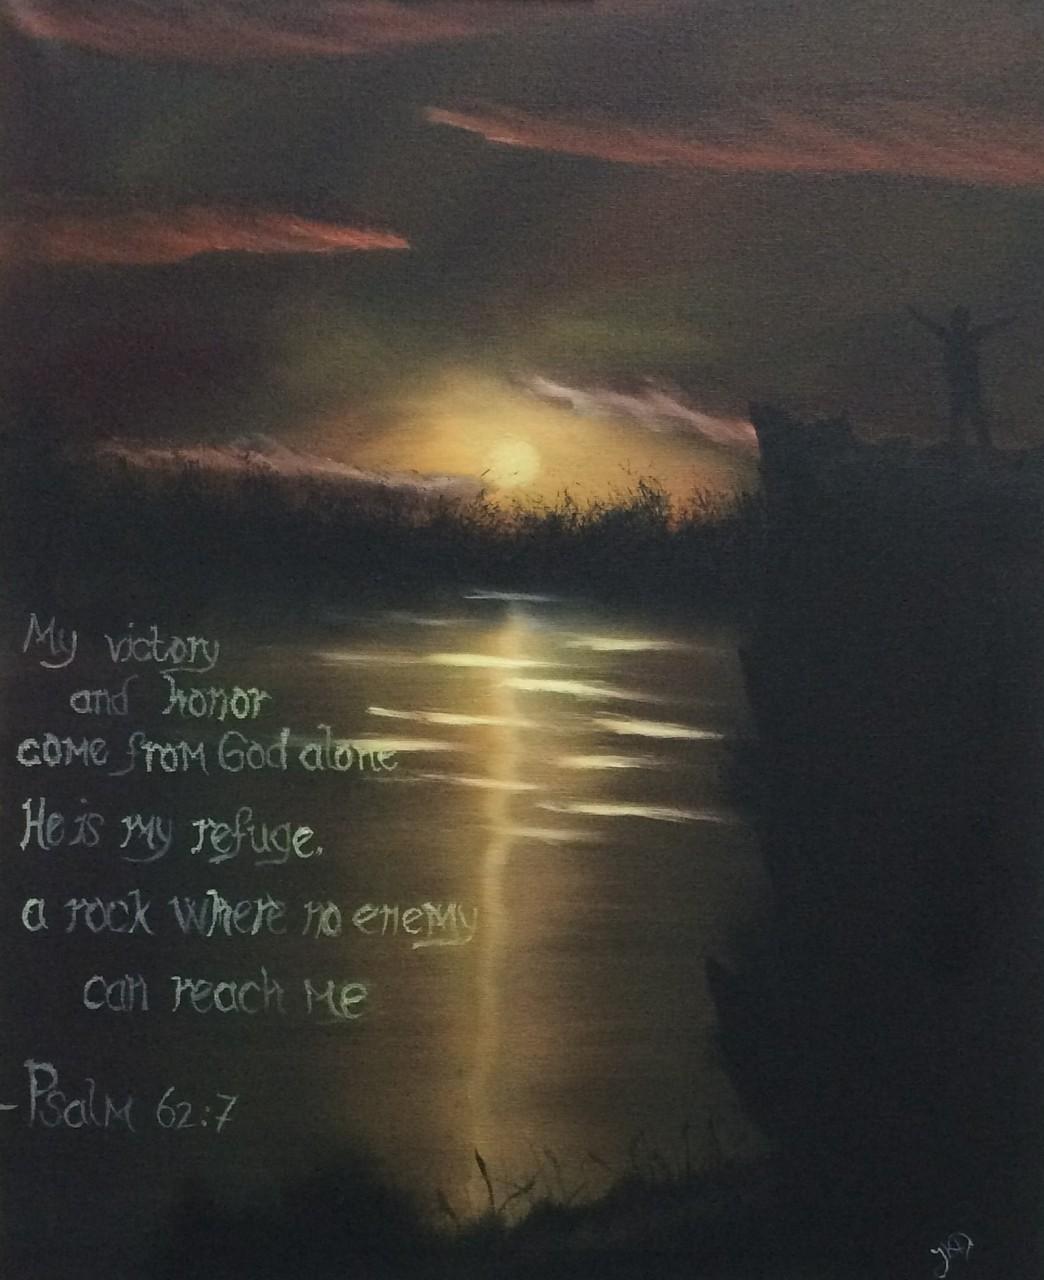 Psalm 62:7